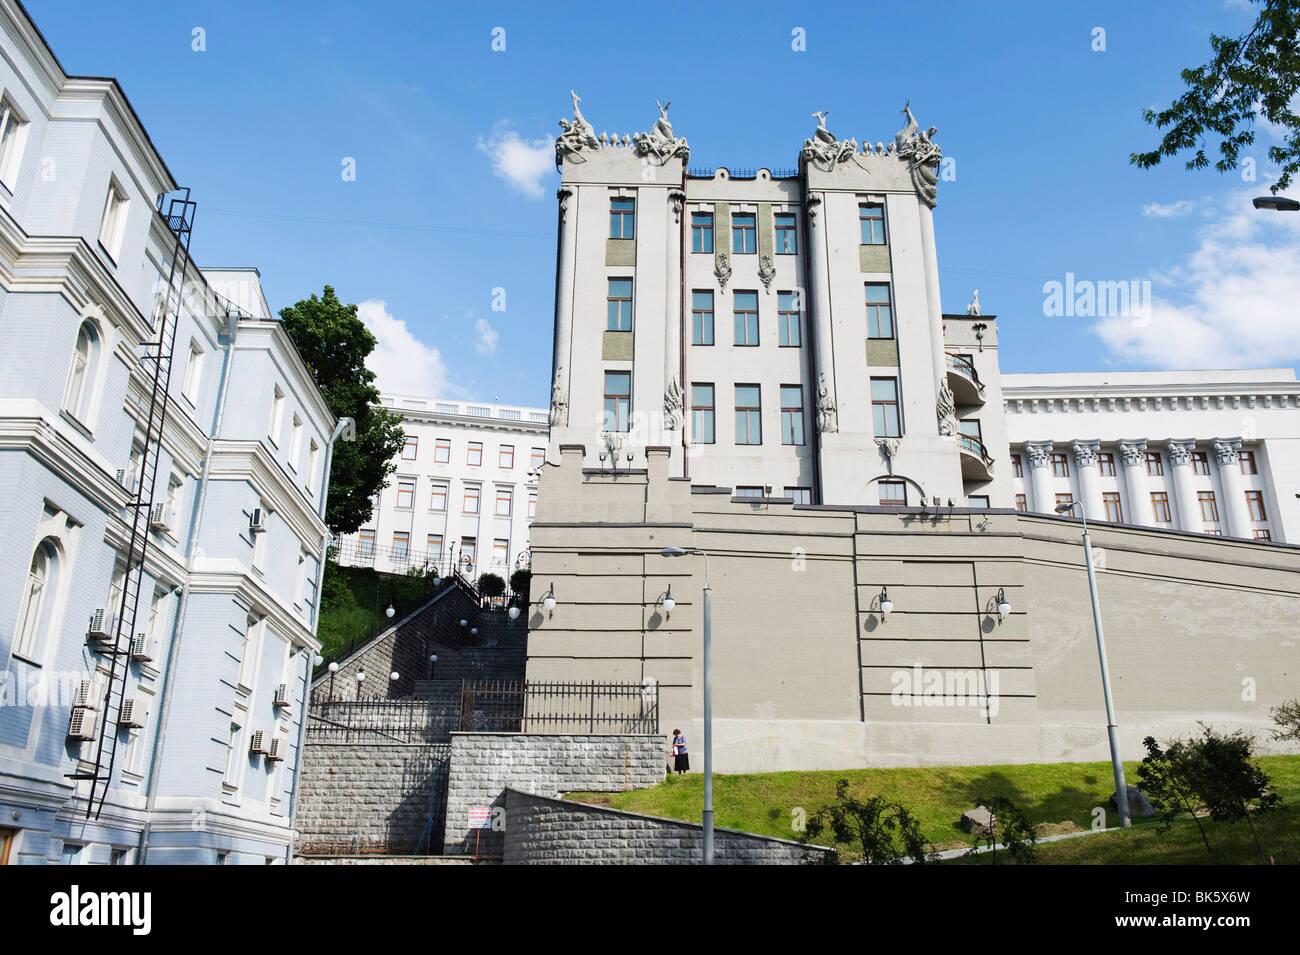 Casa di chimere, xx secolo architettura di Vladislav Horodetsky, Kiev, Ucraina, Europa Immagini Stock